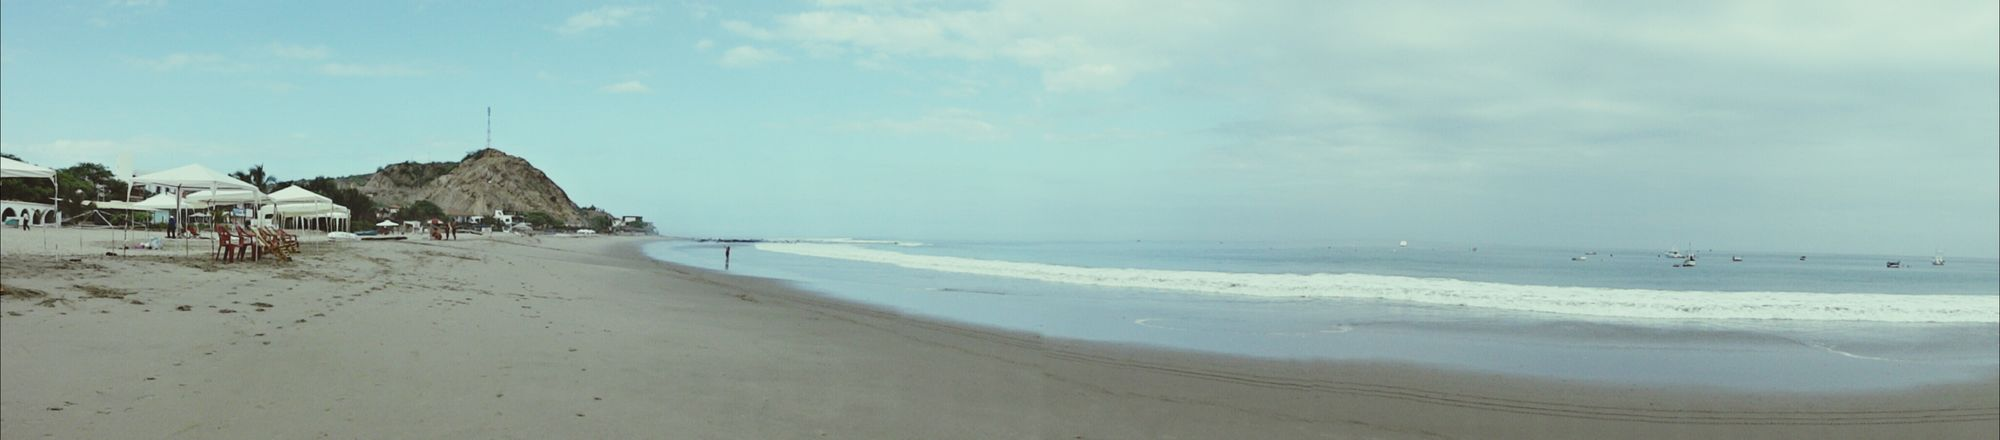 Playa Punta Sal Hello World Beach Piura